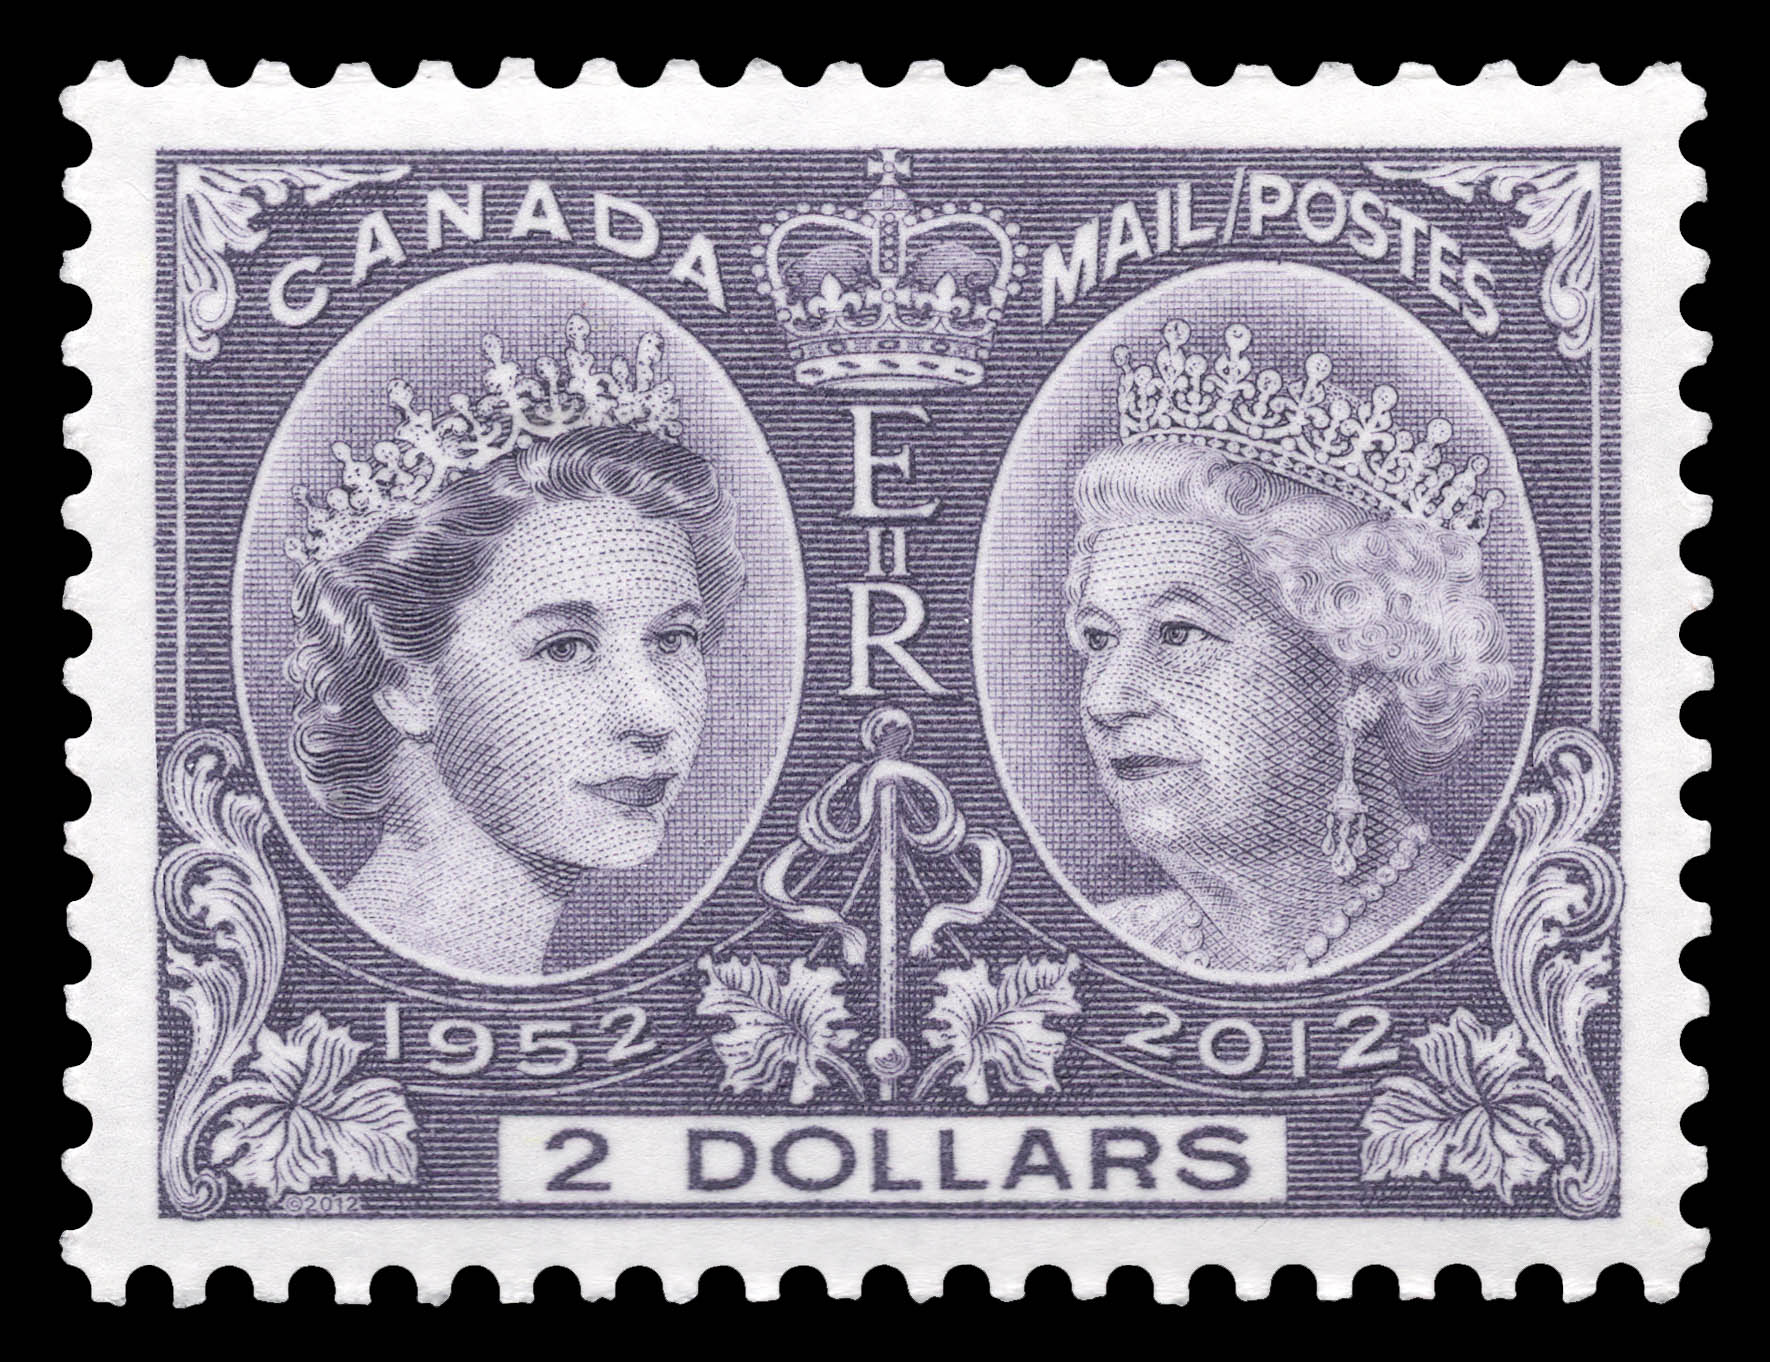 Queen Elizabeth II Diamond Jubilee Canada Postage Stamp   Queen Elizabeth II Diamond Jubilee